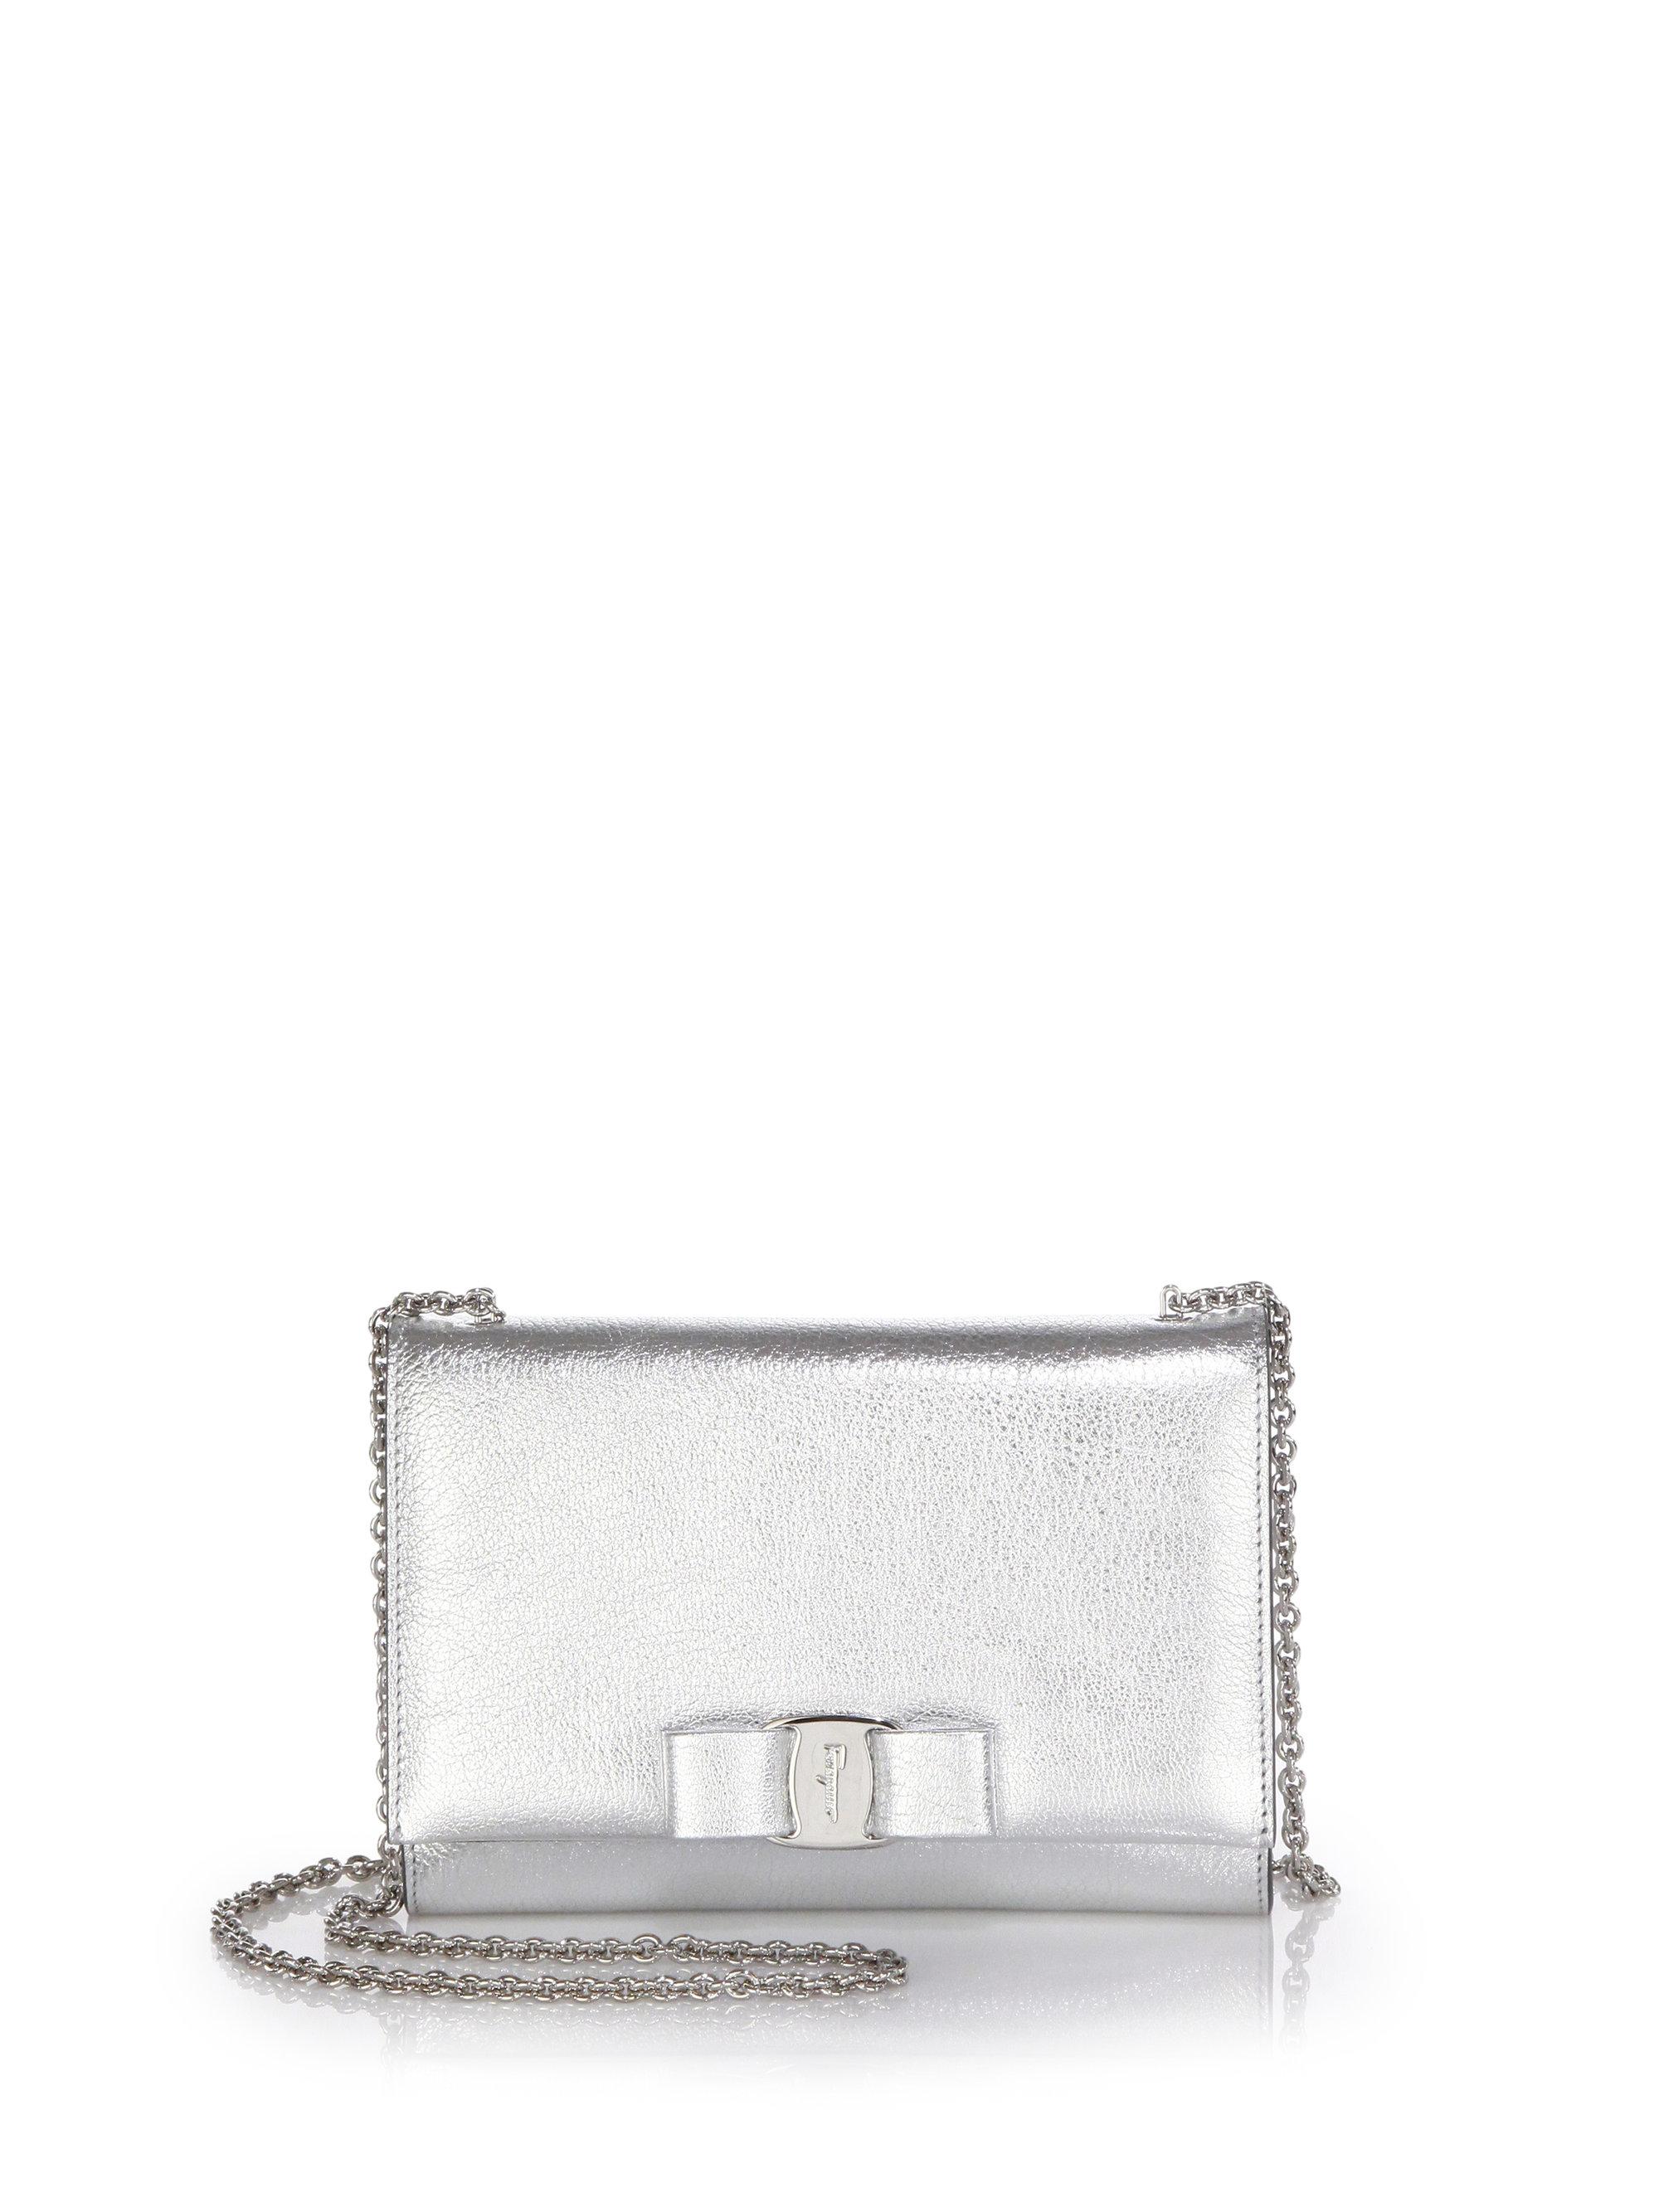 Lyst - Ferragamo Miss Vara Mini Metallic Leather Bow Crossbody Bag ... d6cad8db4ace7